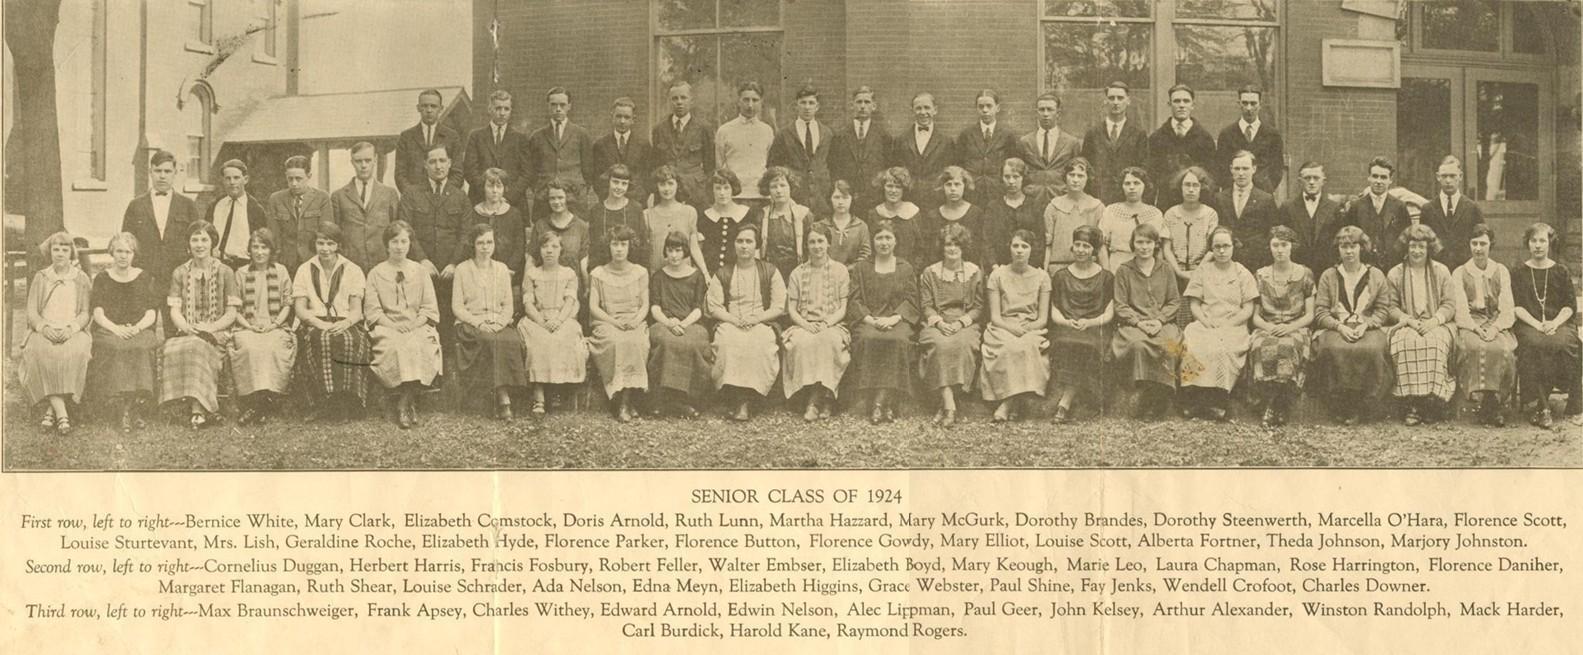 1924 senior class